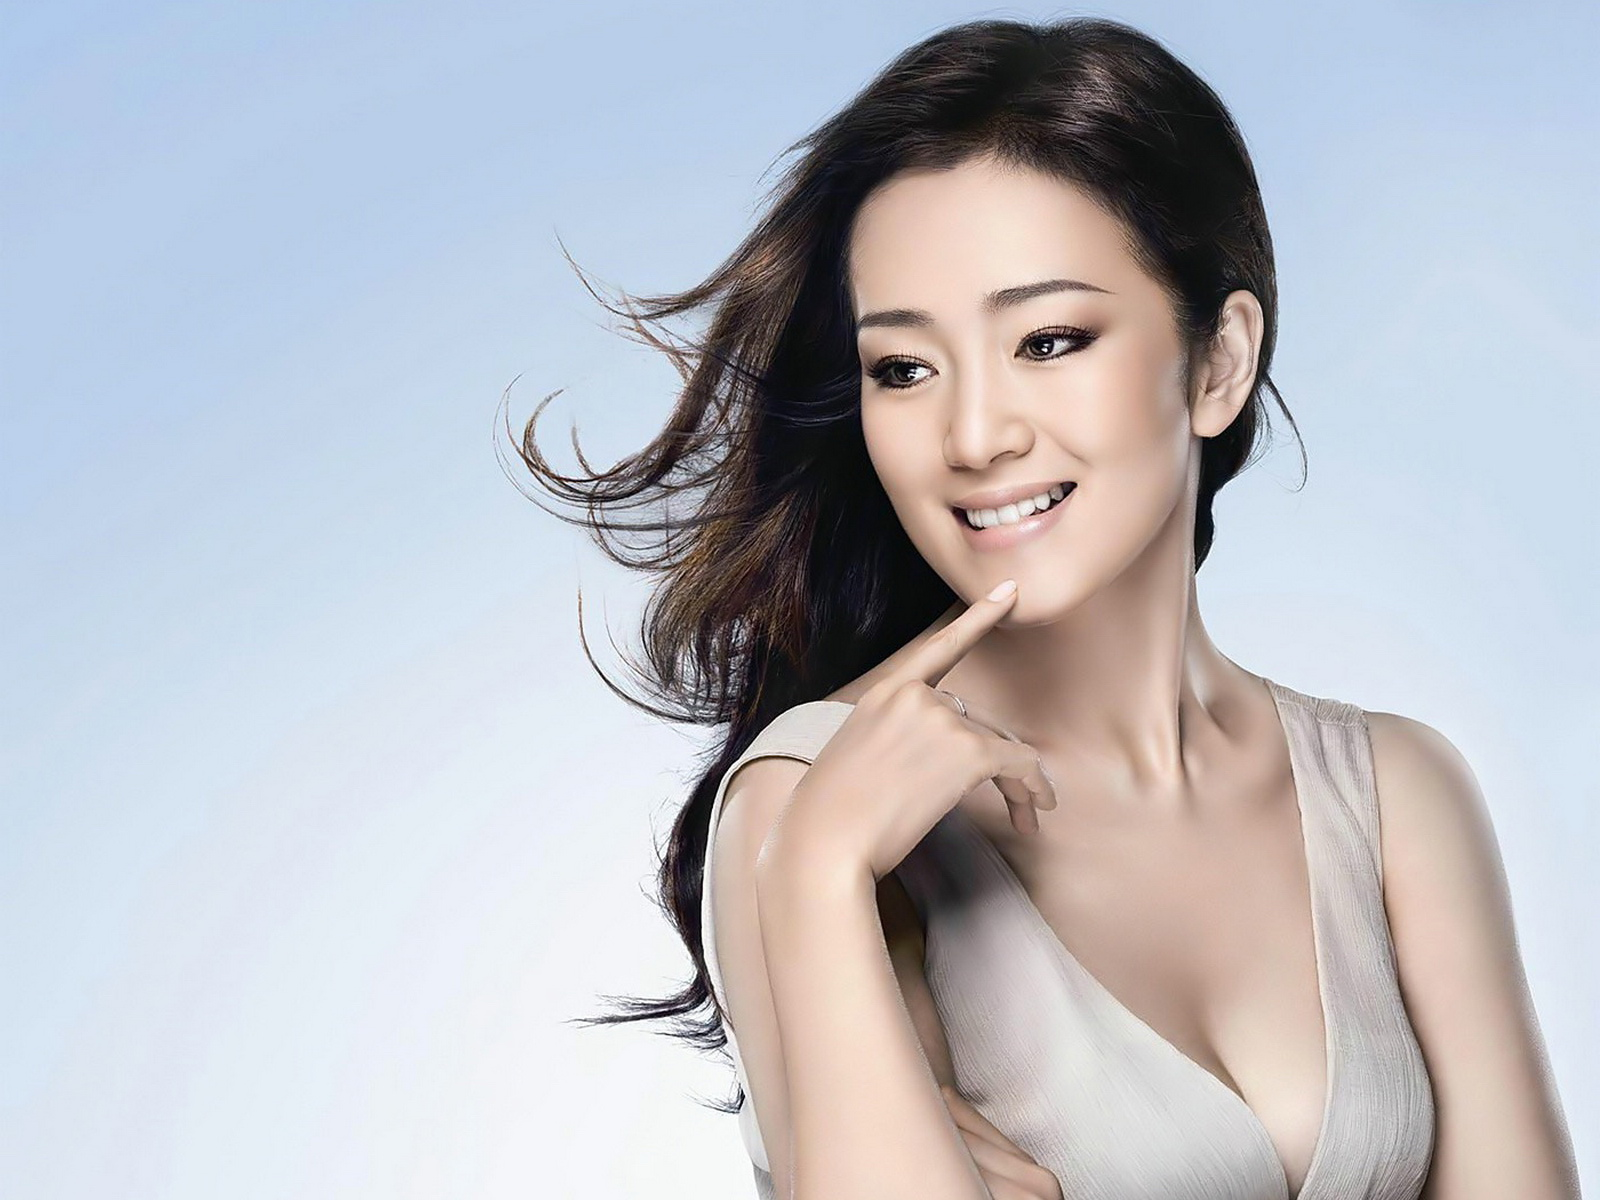 Gong Li - High quality image size 1333x2000 of Gong Li Photos